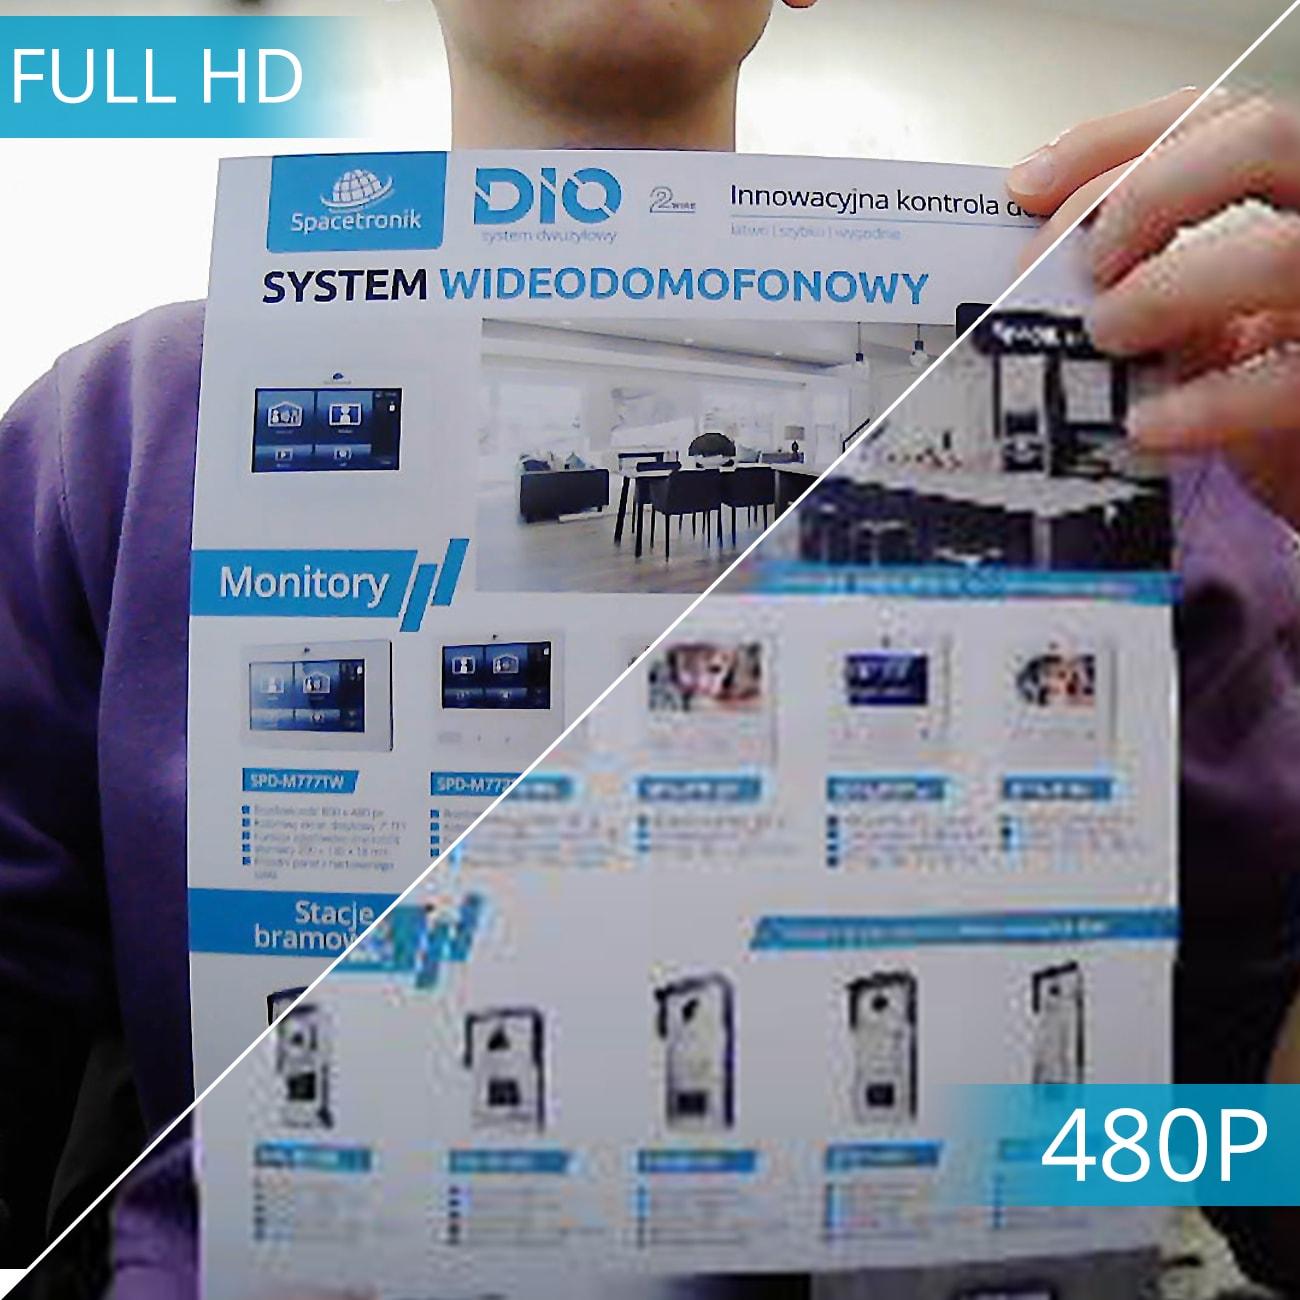 Gaming WebCam For Streaming USB FHD Microphone Camera Auto Focus SP-WCAM11 - 13